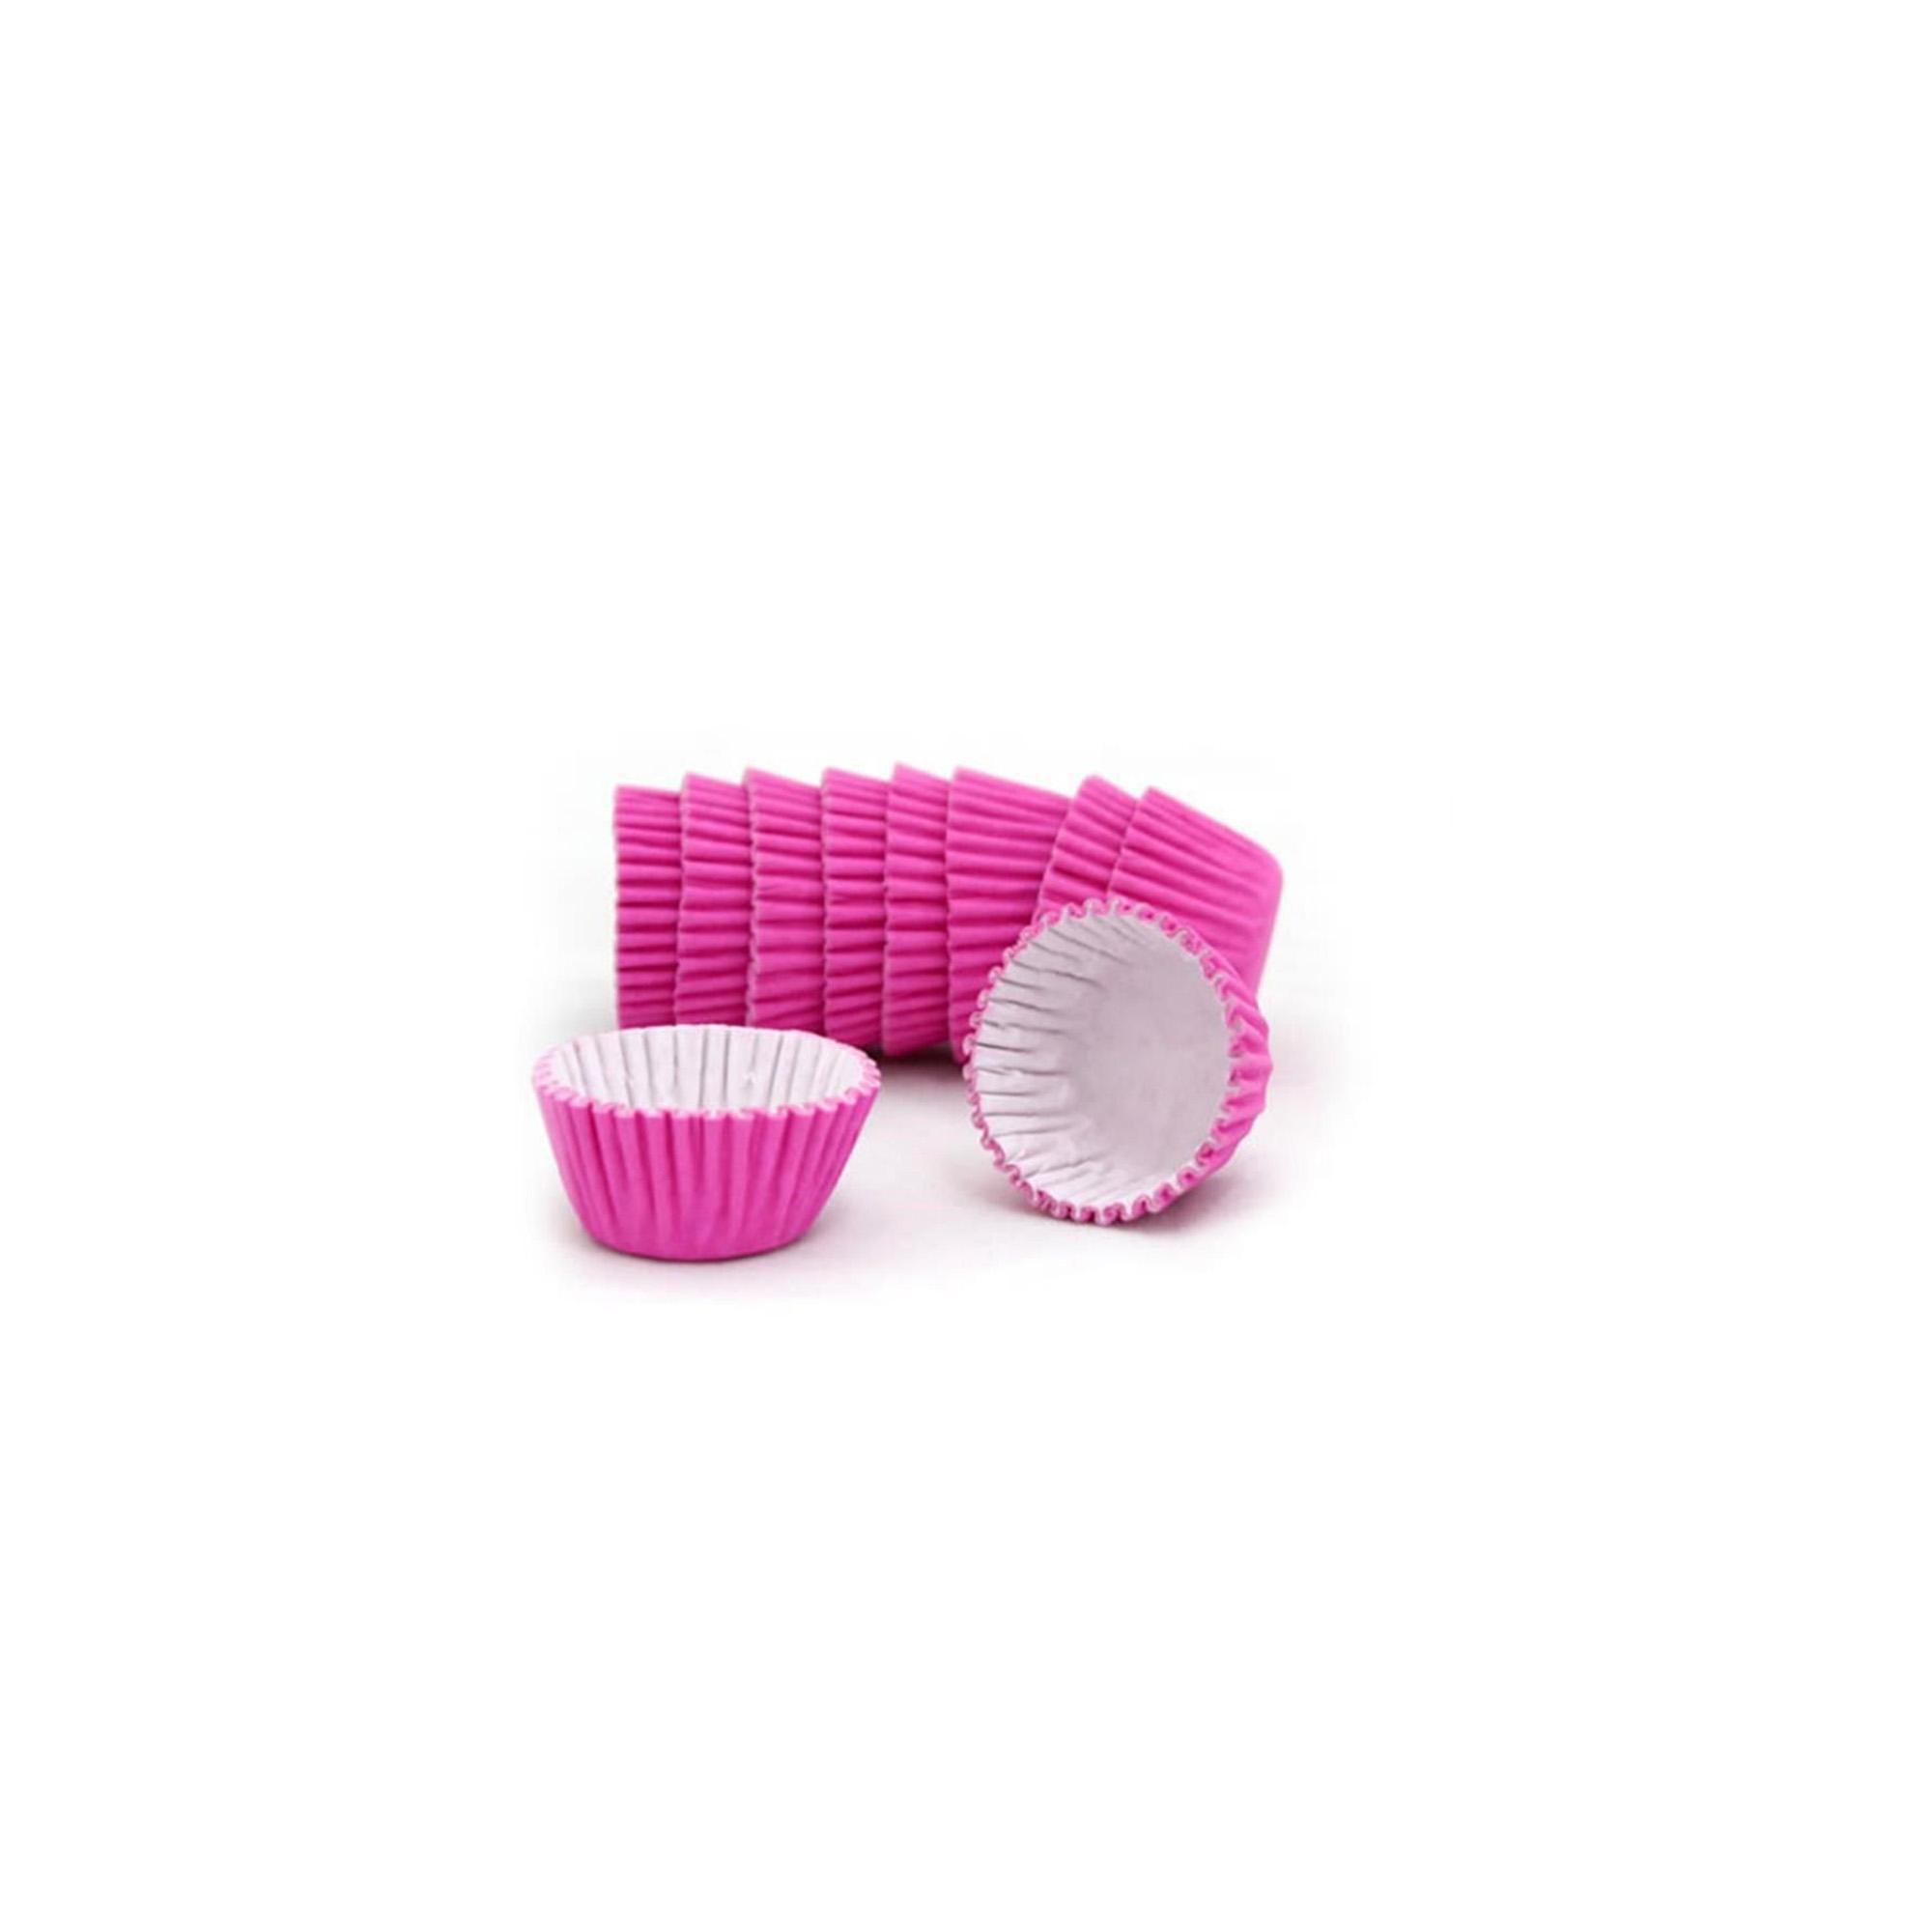 FORMINHA DE PAPEL N5 COM 100 UNIDADES MAGO - Pink